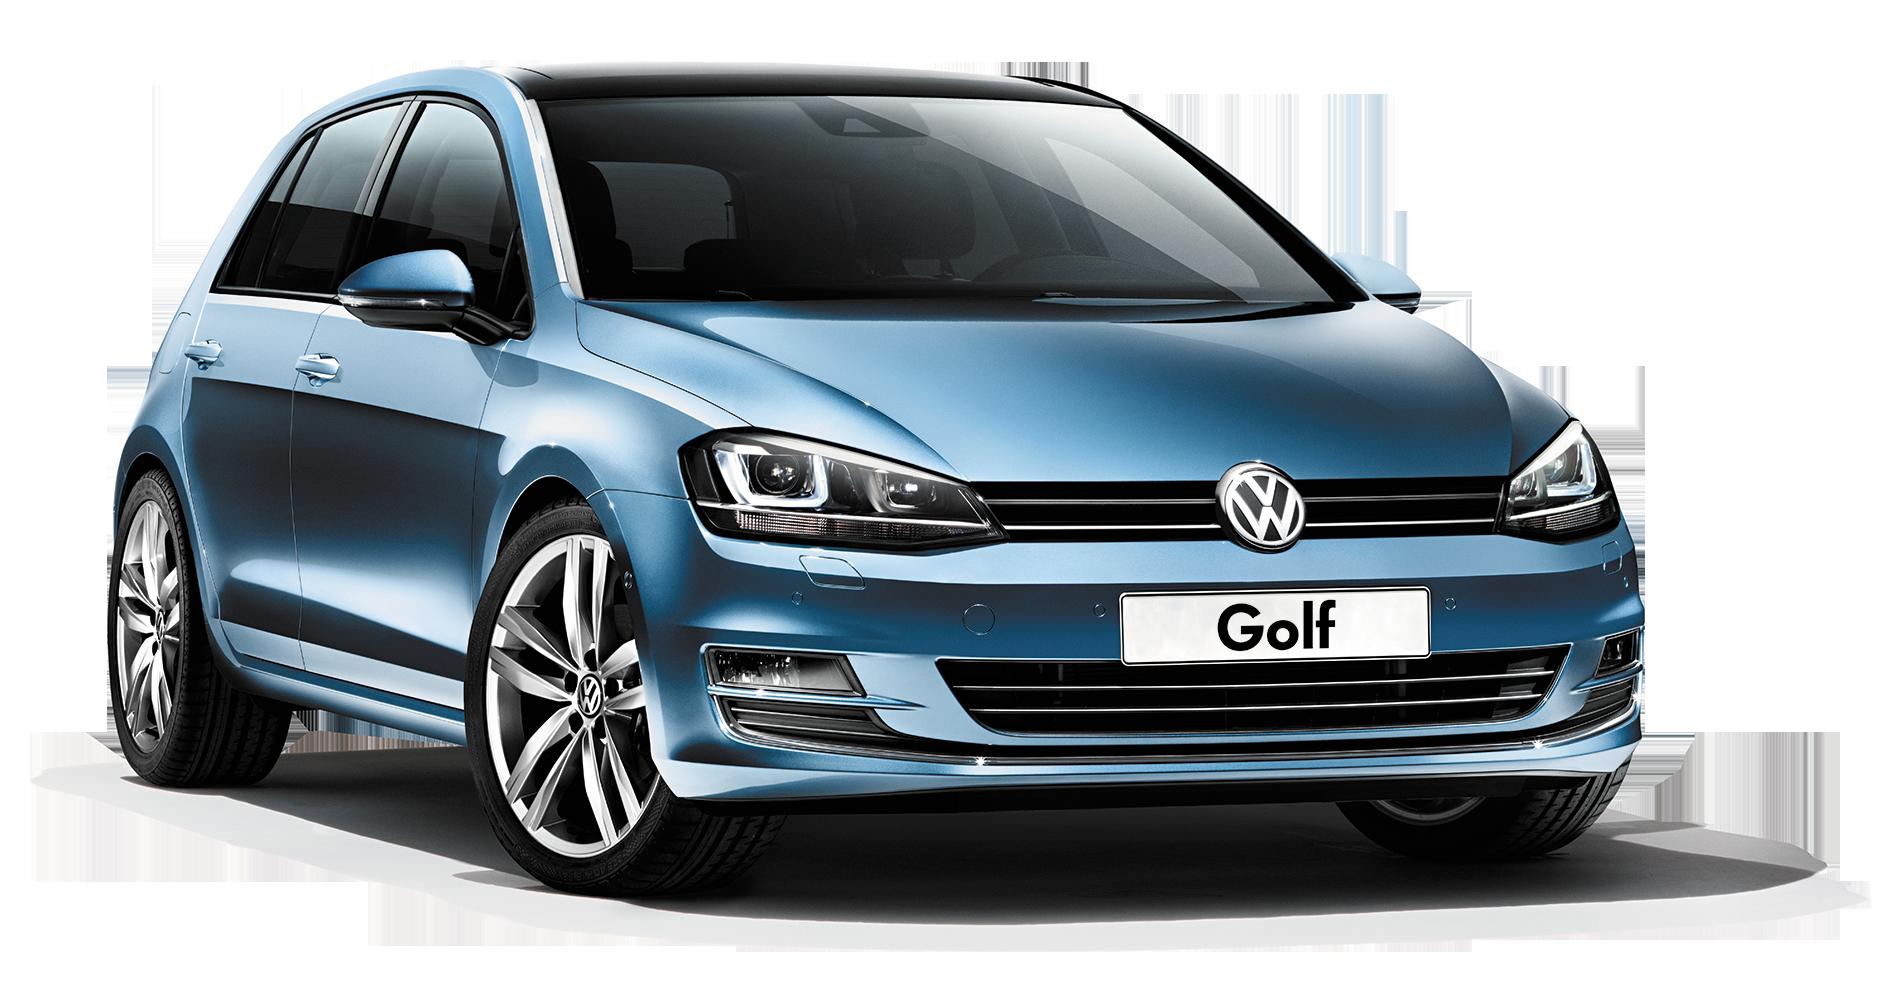 Golf car clipart graphic transparent Volkswagen PNG Picture | Web Icons PNG graphic transparent